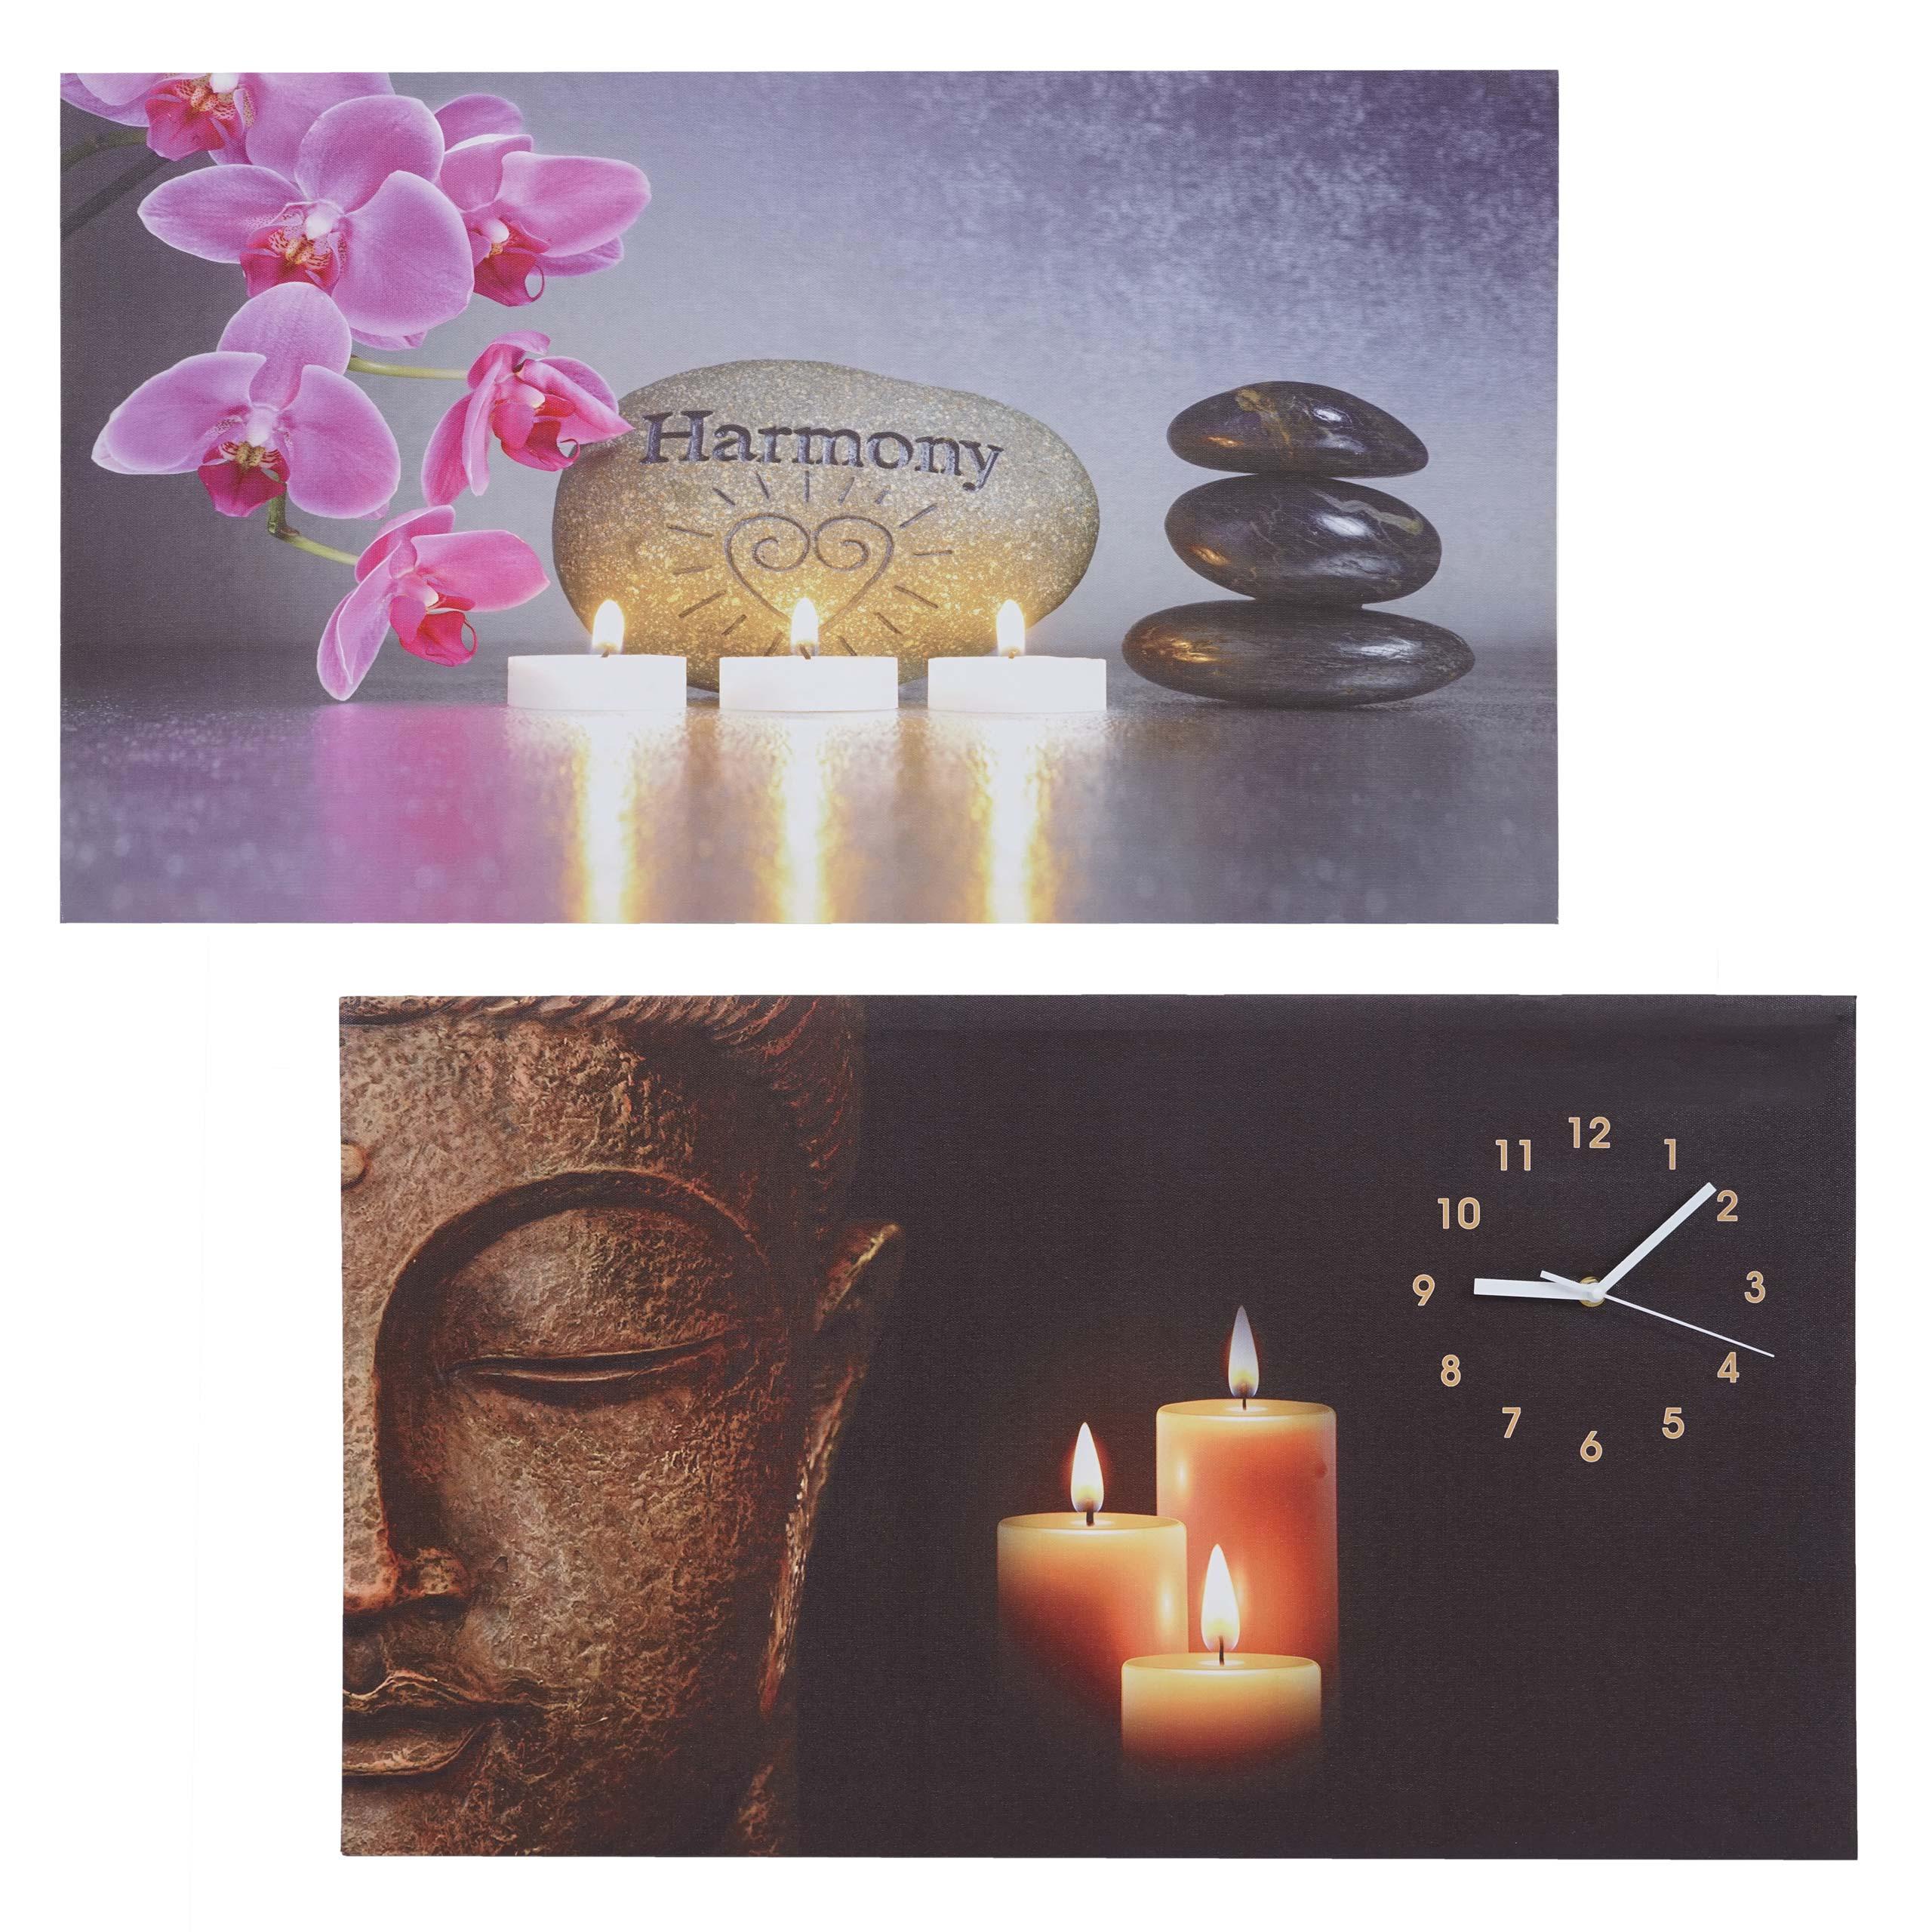 Mendler 2x LED-Bild, Leinwandbild Leuchtbild Wandbild, Timer Buddha/Harmony Wanduhr 70x40cm ~ Variantenangeb 69284